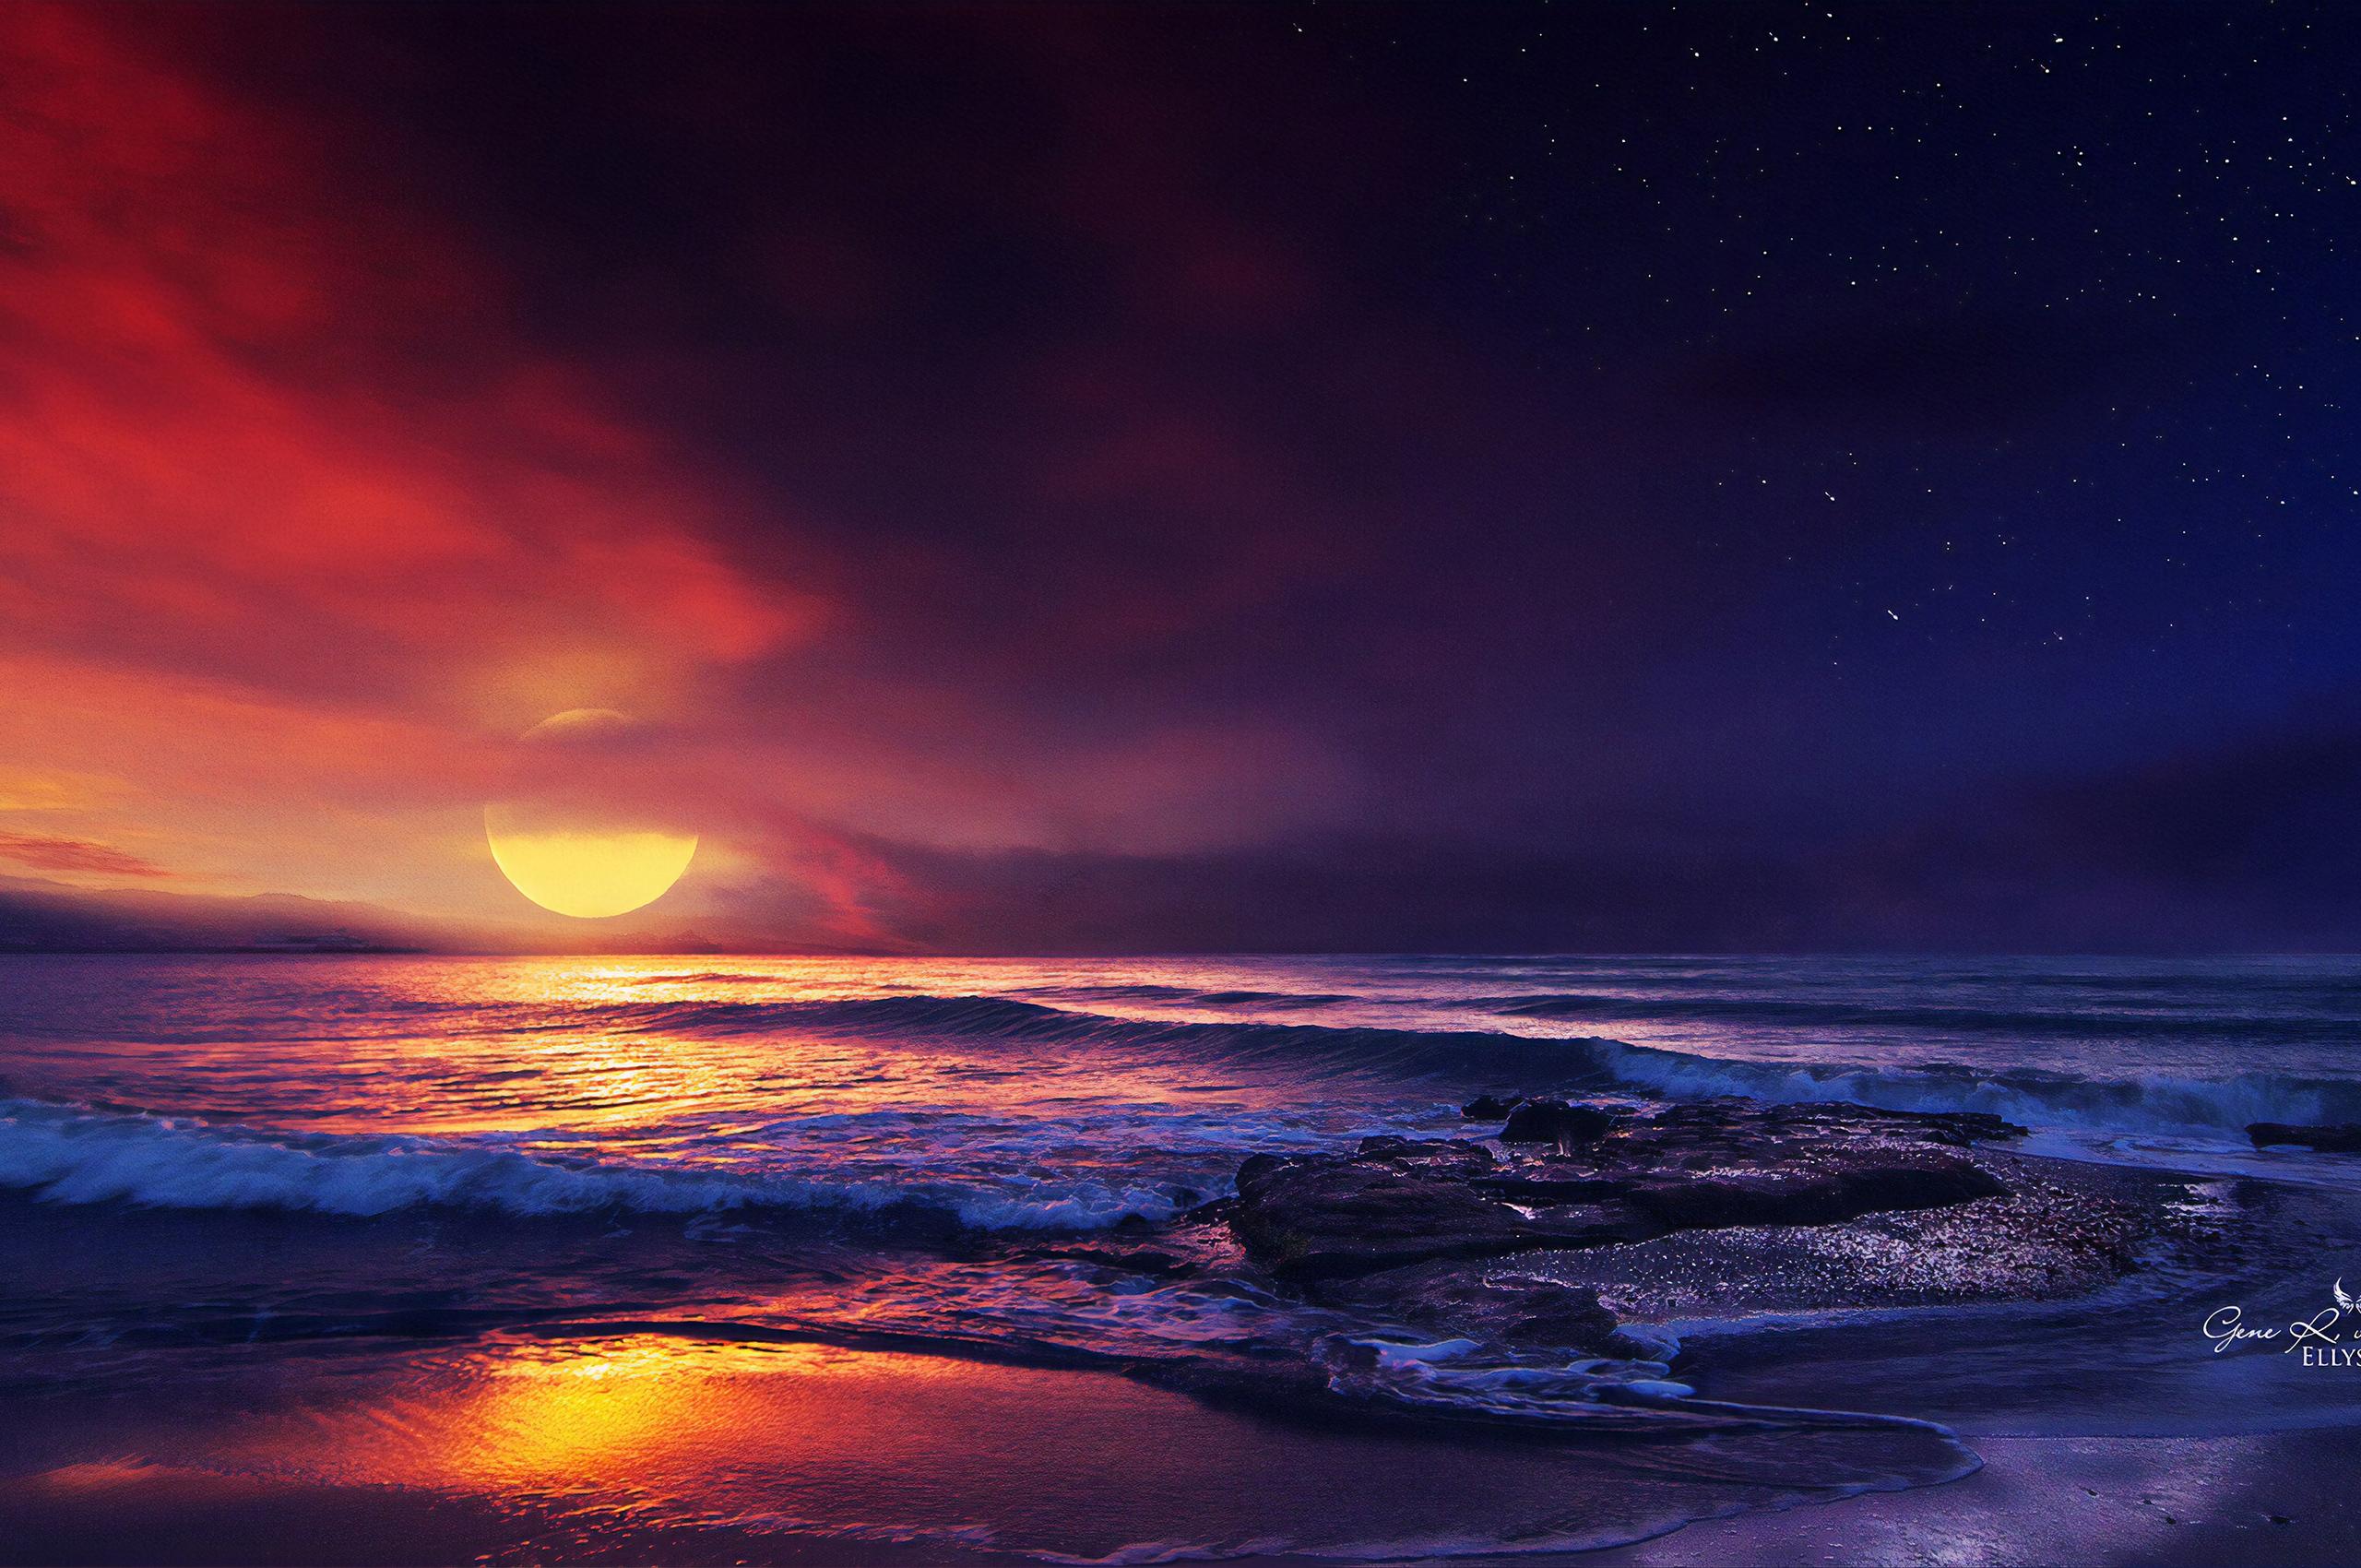 ocean-sunset-illustration-ir.jpg